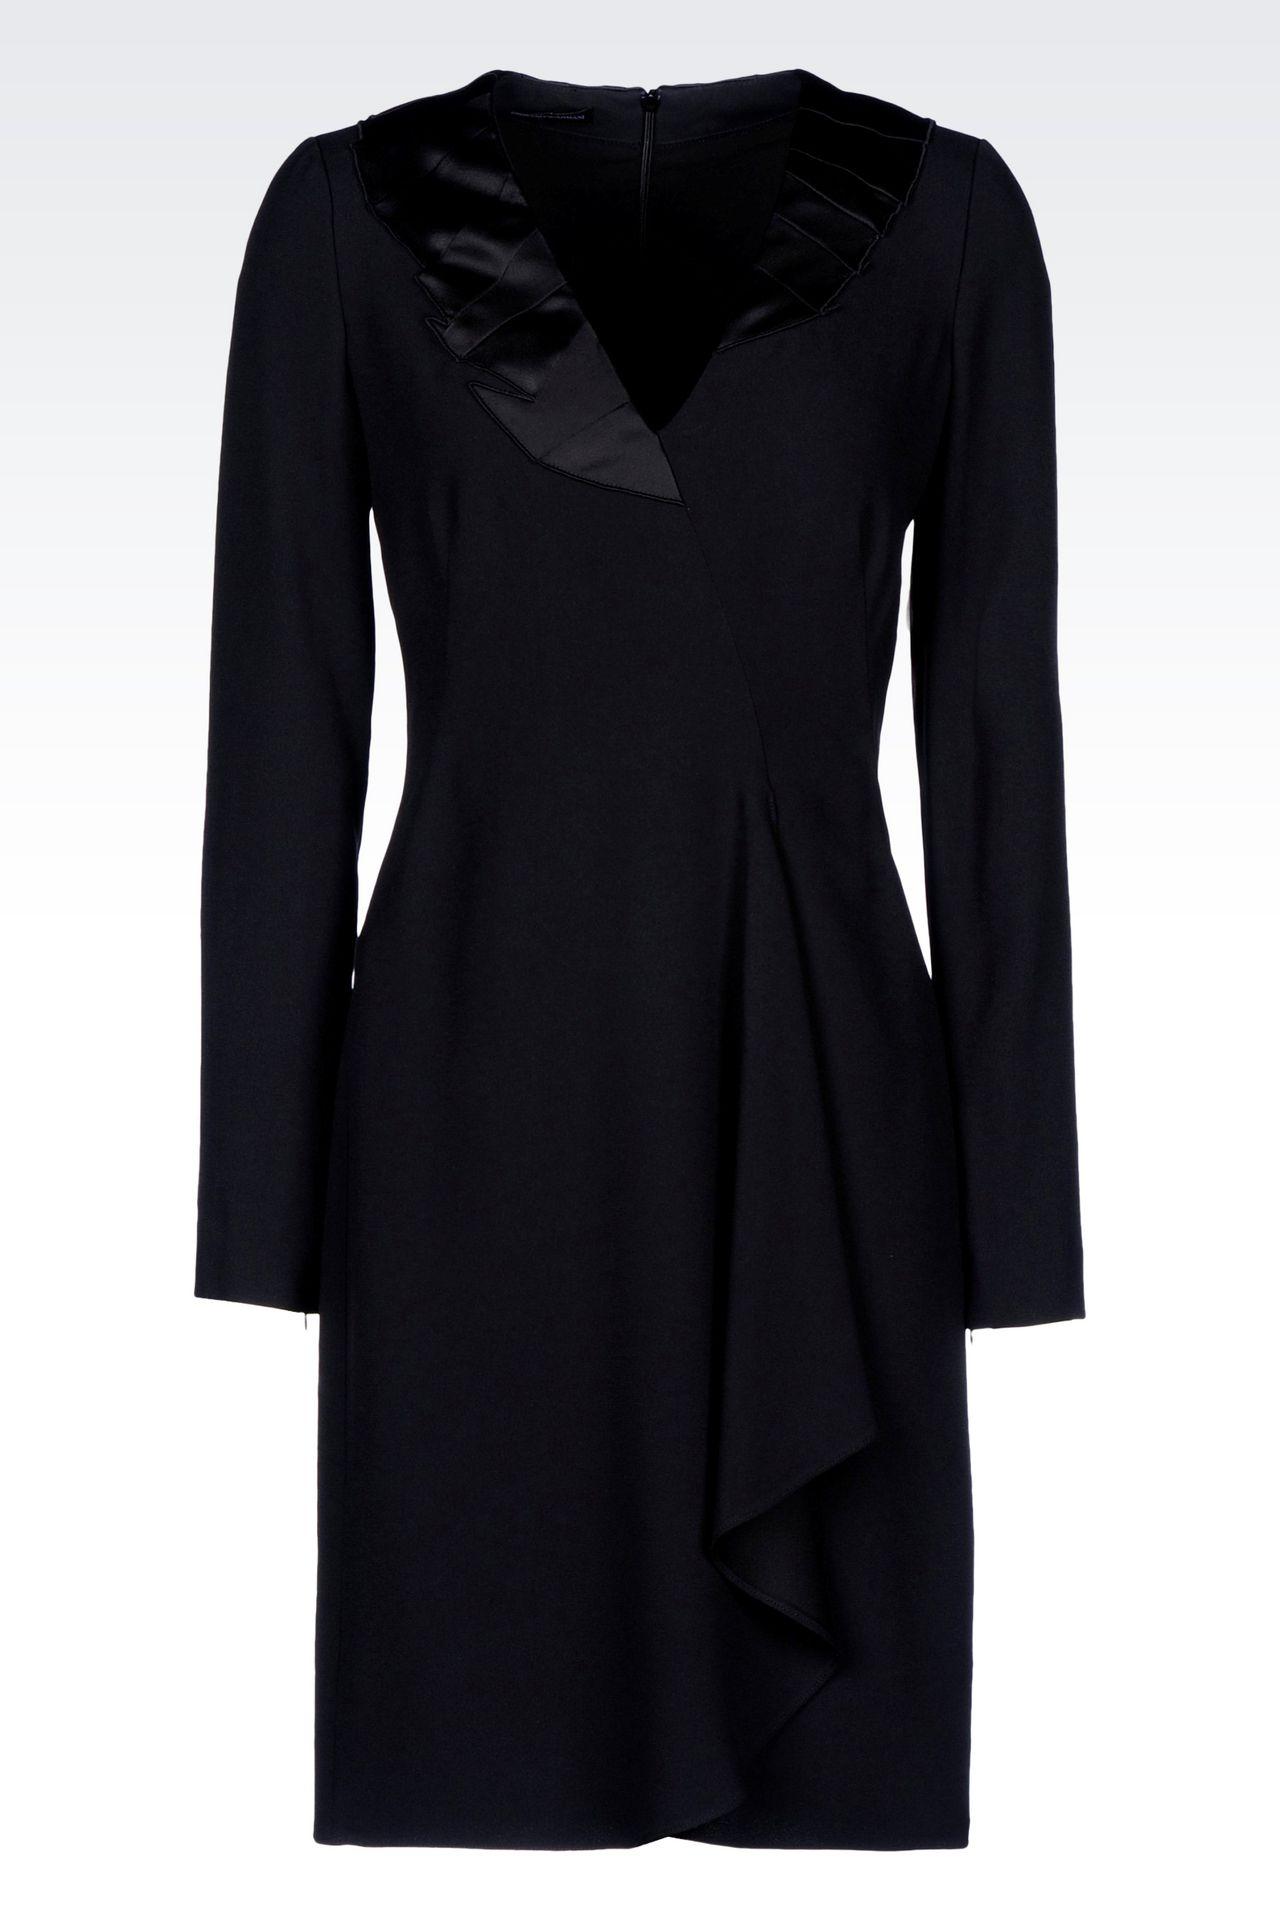 DRAPED DRESS IN CADY: Short Dresses Women by Armani - 0